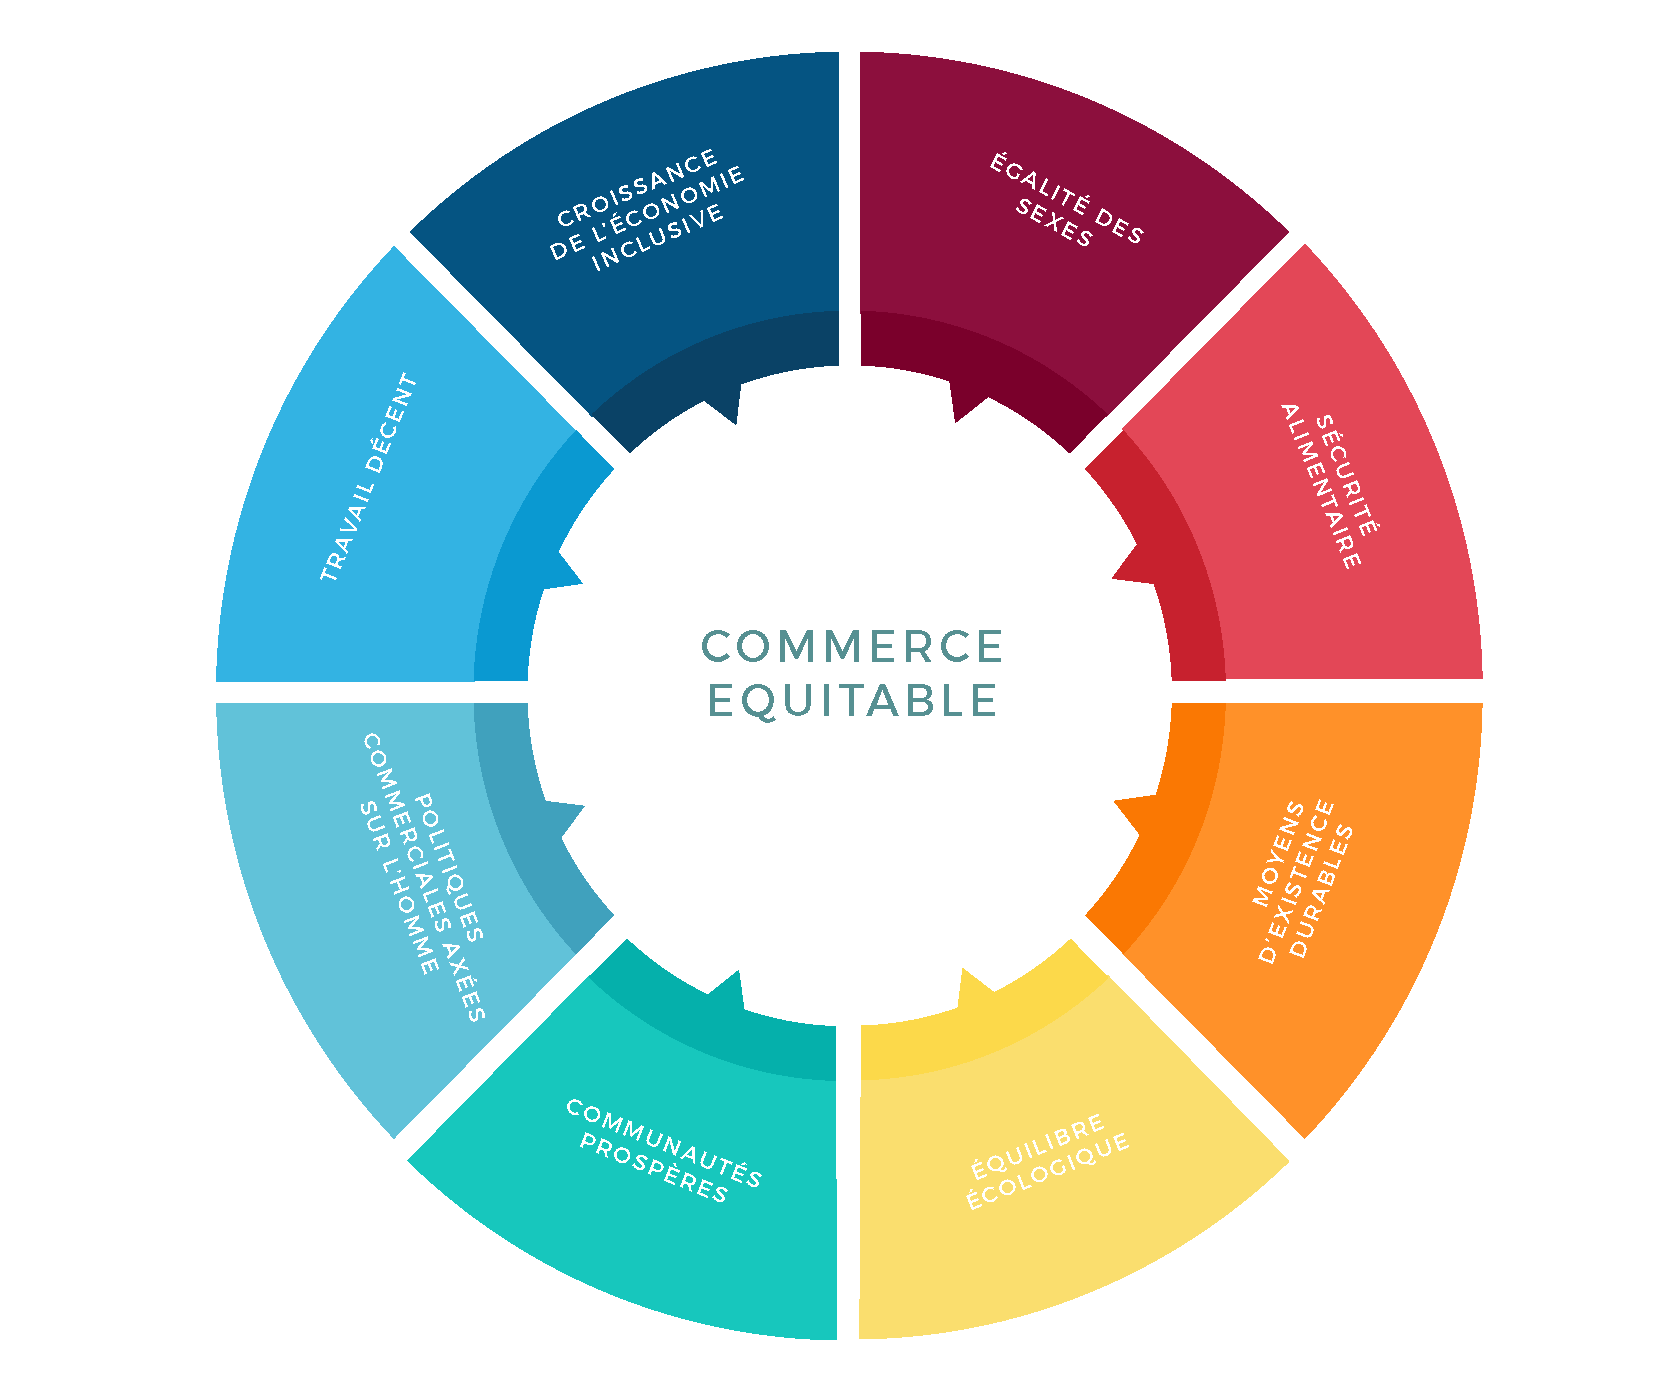 commerce equitable asie - Artisanat et commerce equitable